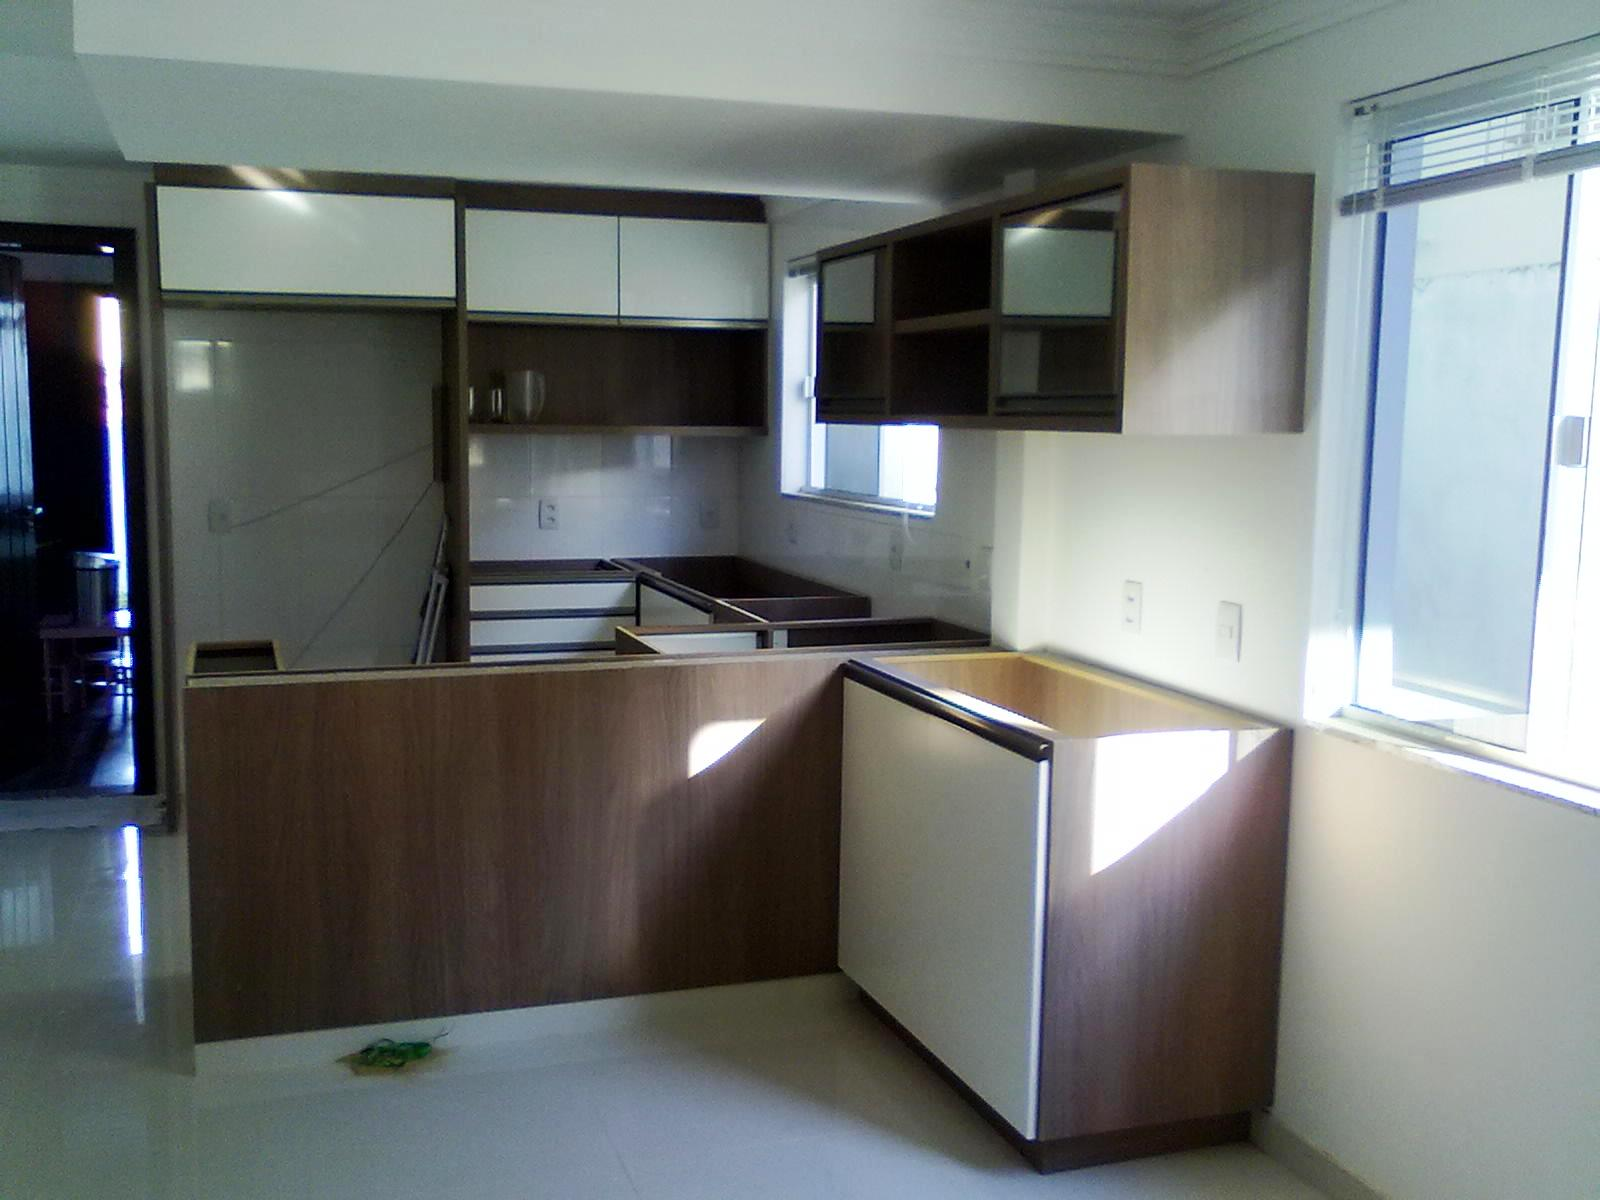 armario cozinha casas bahia Quotes #3A4566 1600 1200